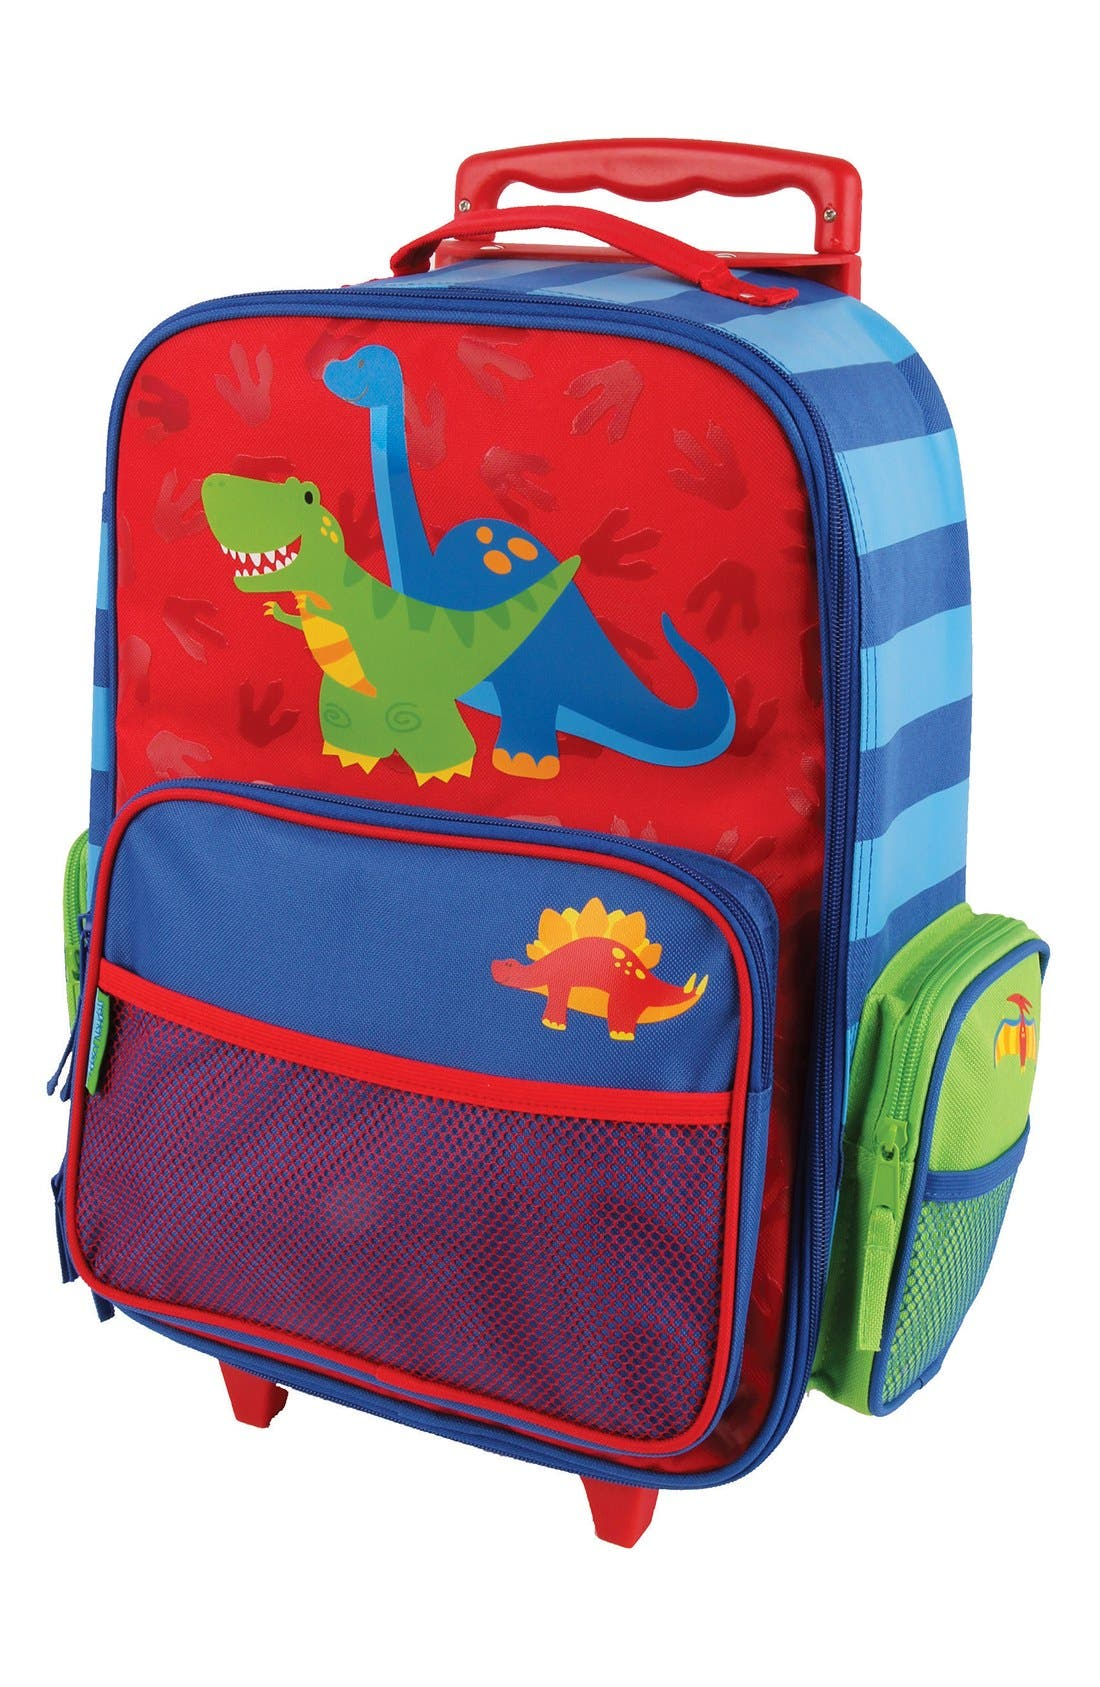 Stephen Joseph Rolling Suitcase (Kids)